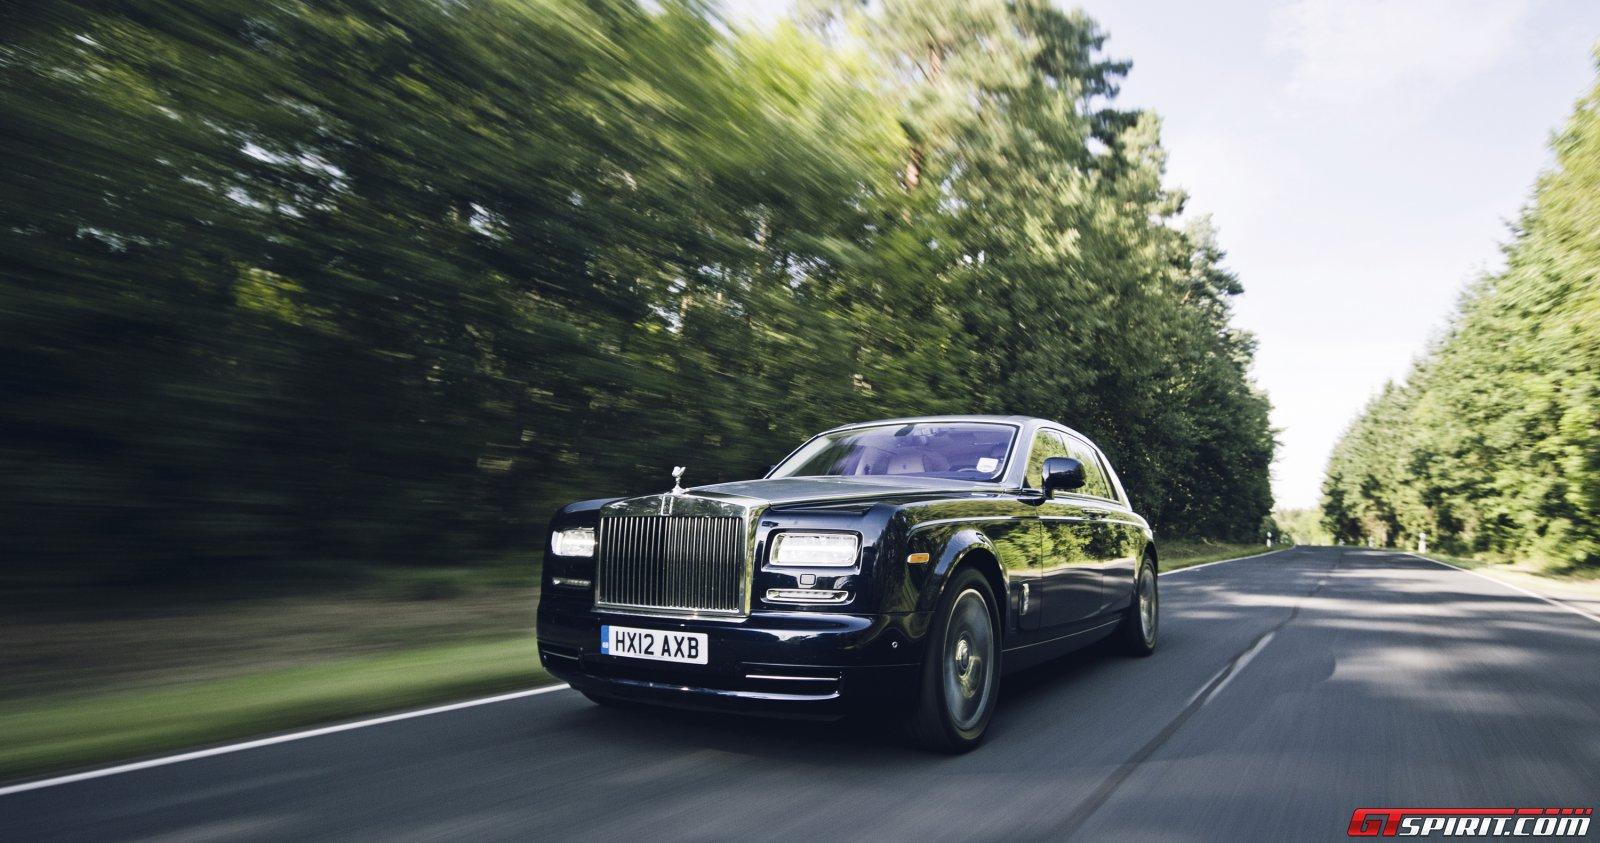 Road Test: Rolls Royce Phantom Series II GTspirit